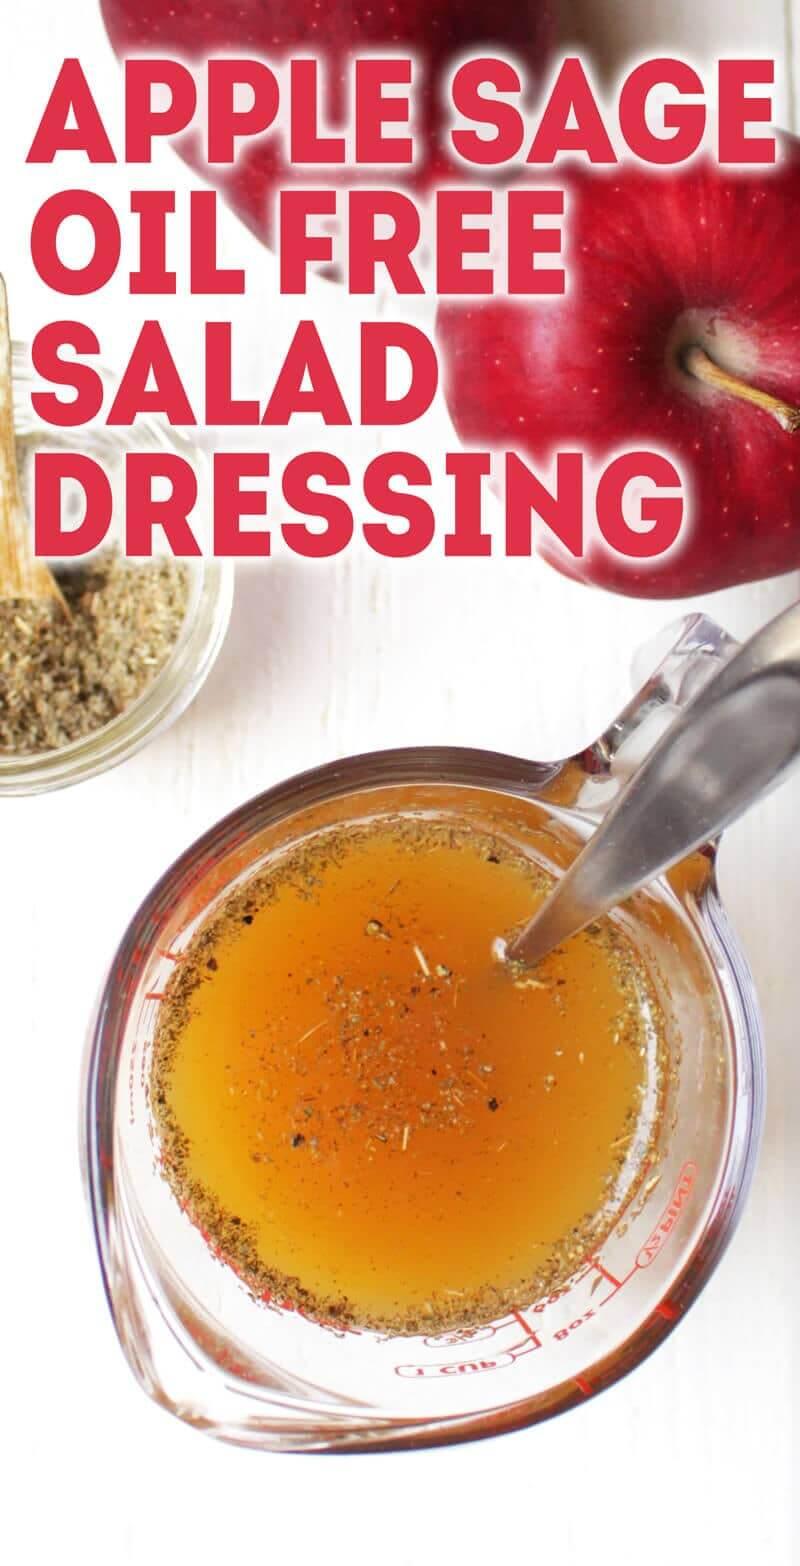 Apple Sage Oil-Free Salad Dressing - only 3 ingredients!